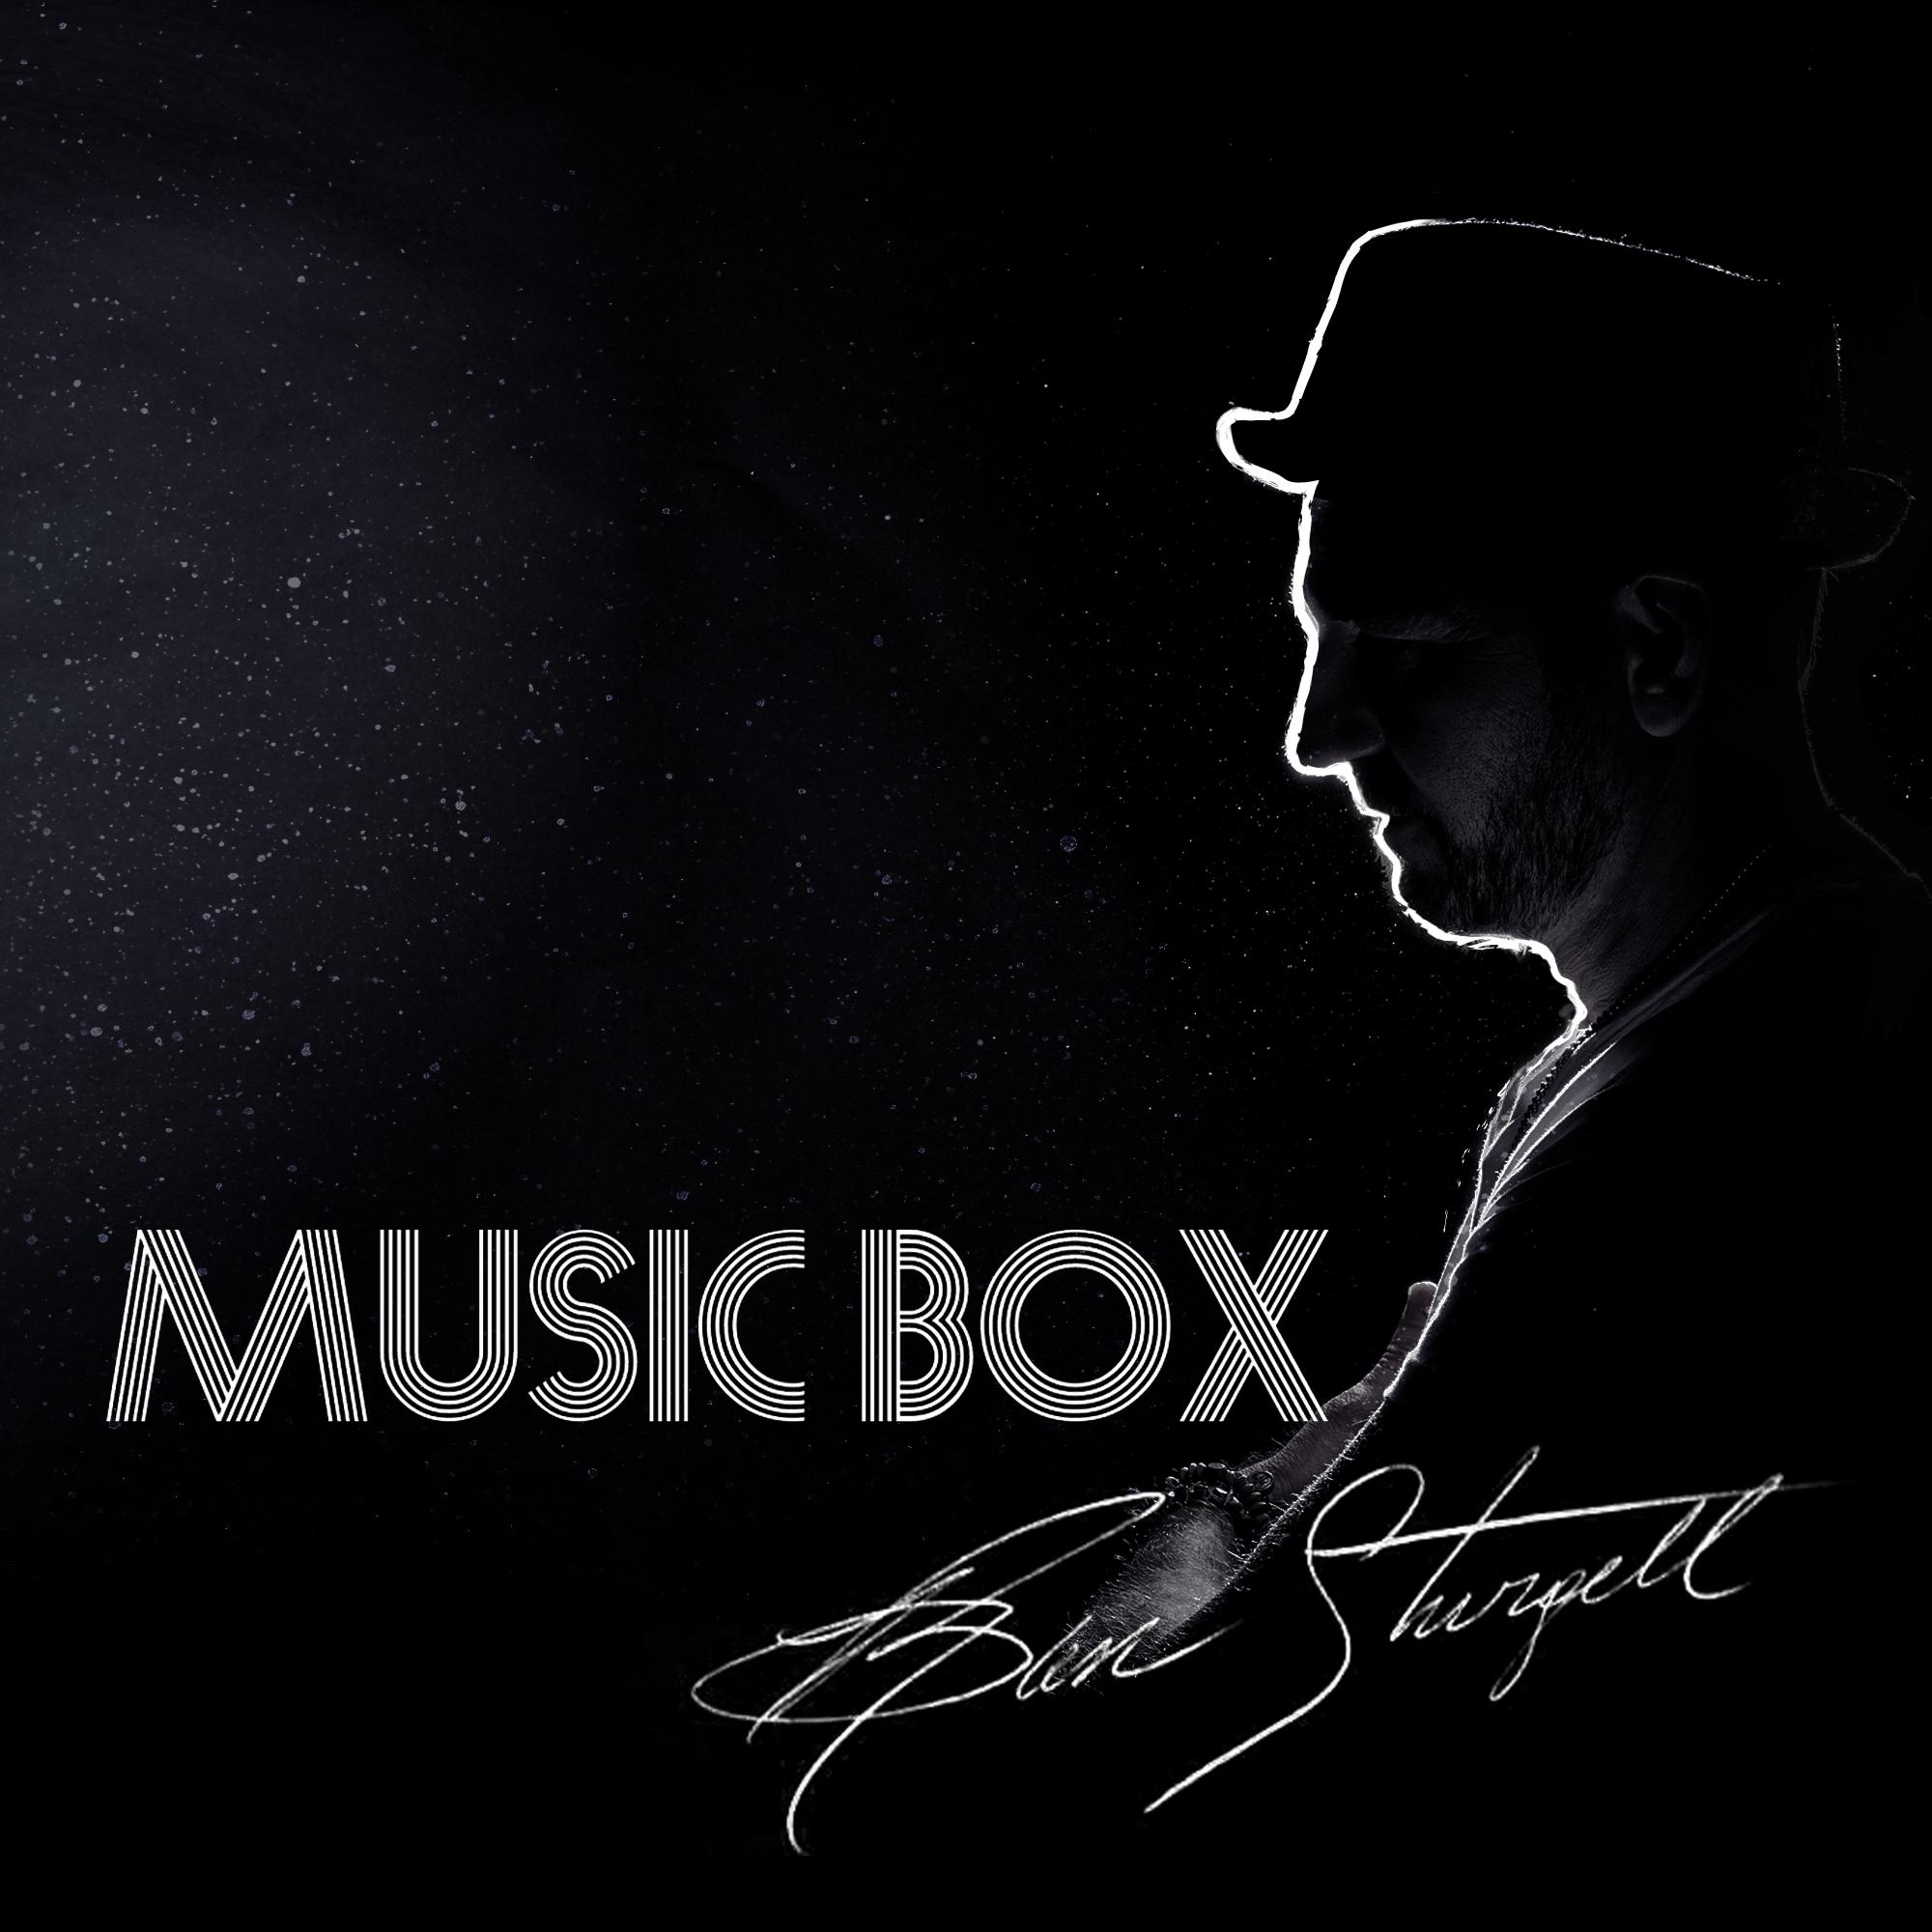 ben-sturgell---music-box-recording-engineer-2015_21657982043_o.jpg